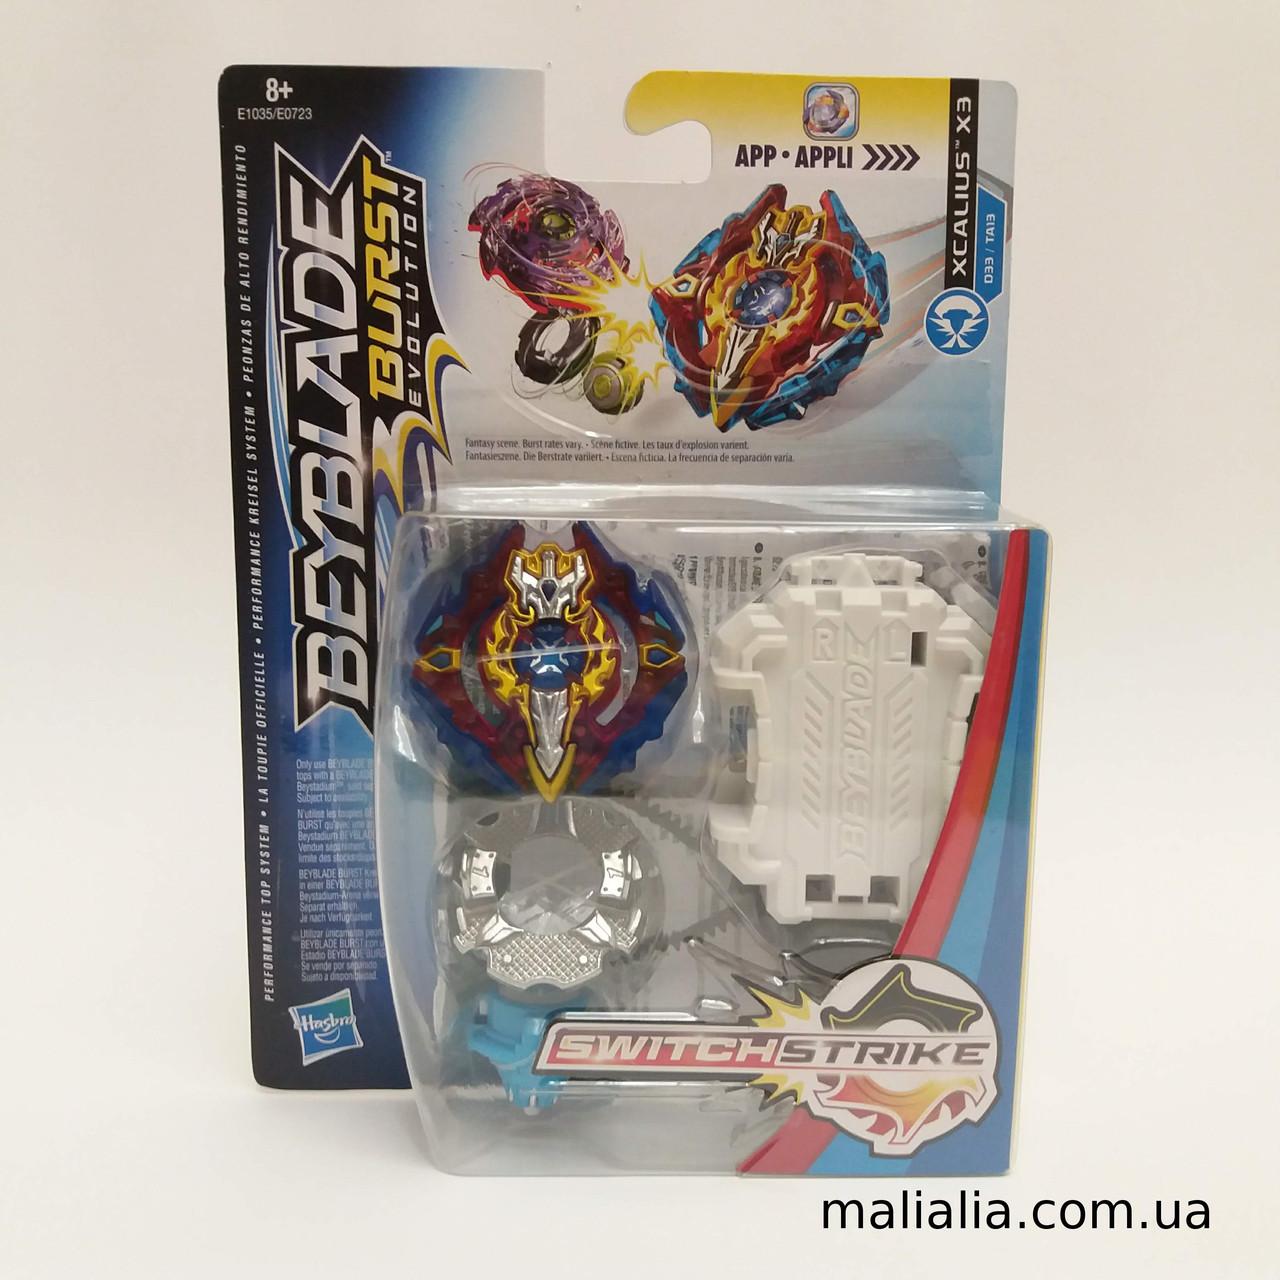 Волчок Свич Страйк Икскалиус и пусковое устр. Beyblade burst Hasbro BEY SST Xcalius X3 E0723/E1035